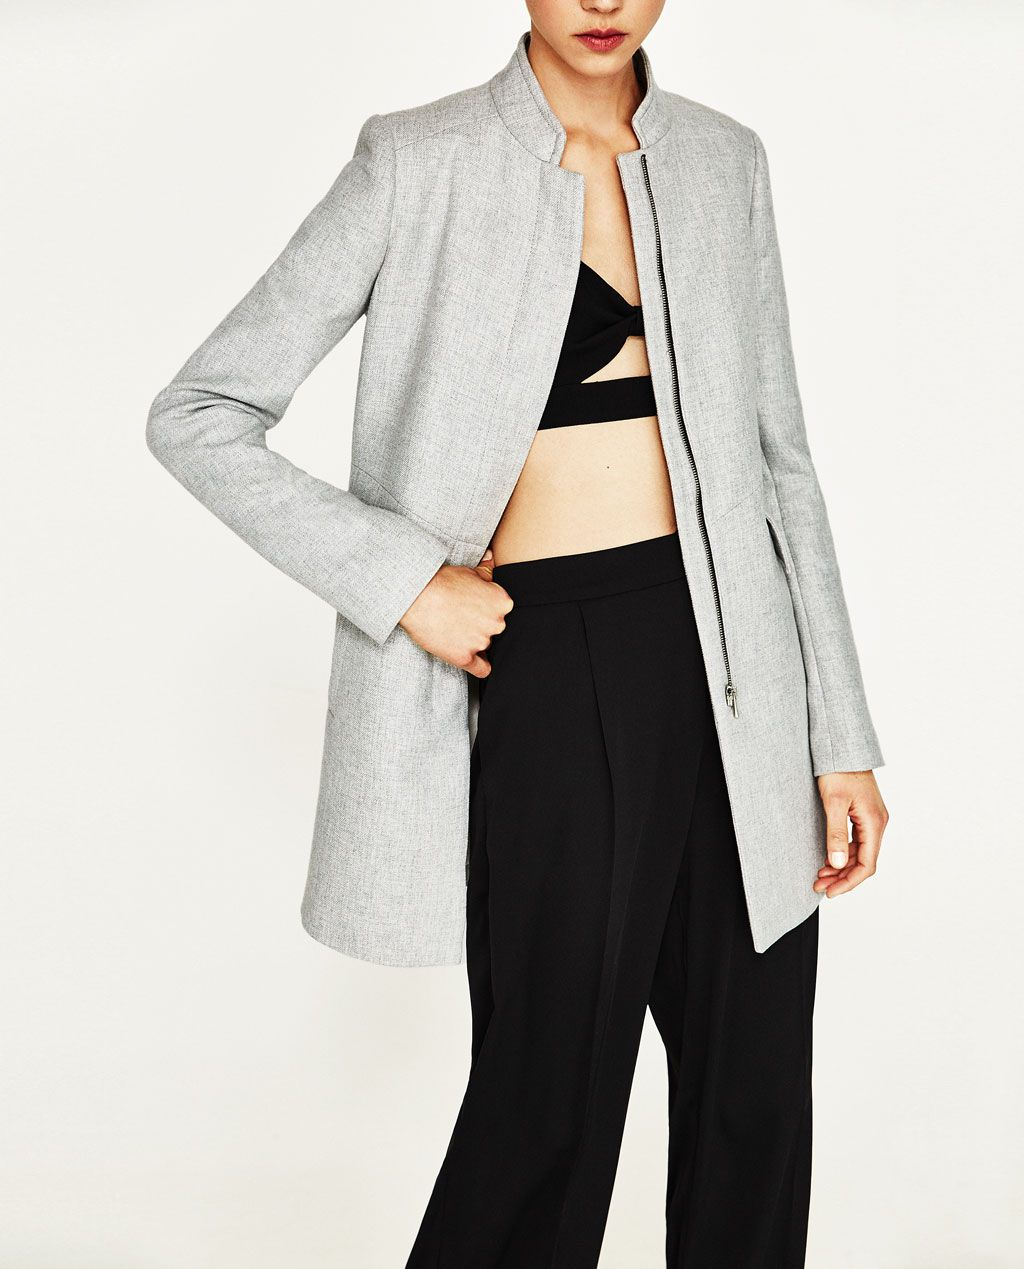 75e2875ad4 INVERTED LAPEL FROCK COAT-Coats-OUTERWEAR-WOMAN